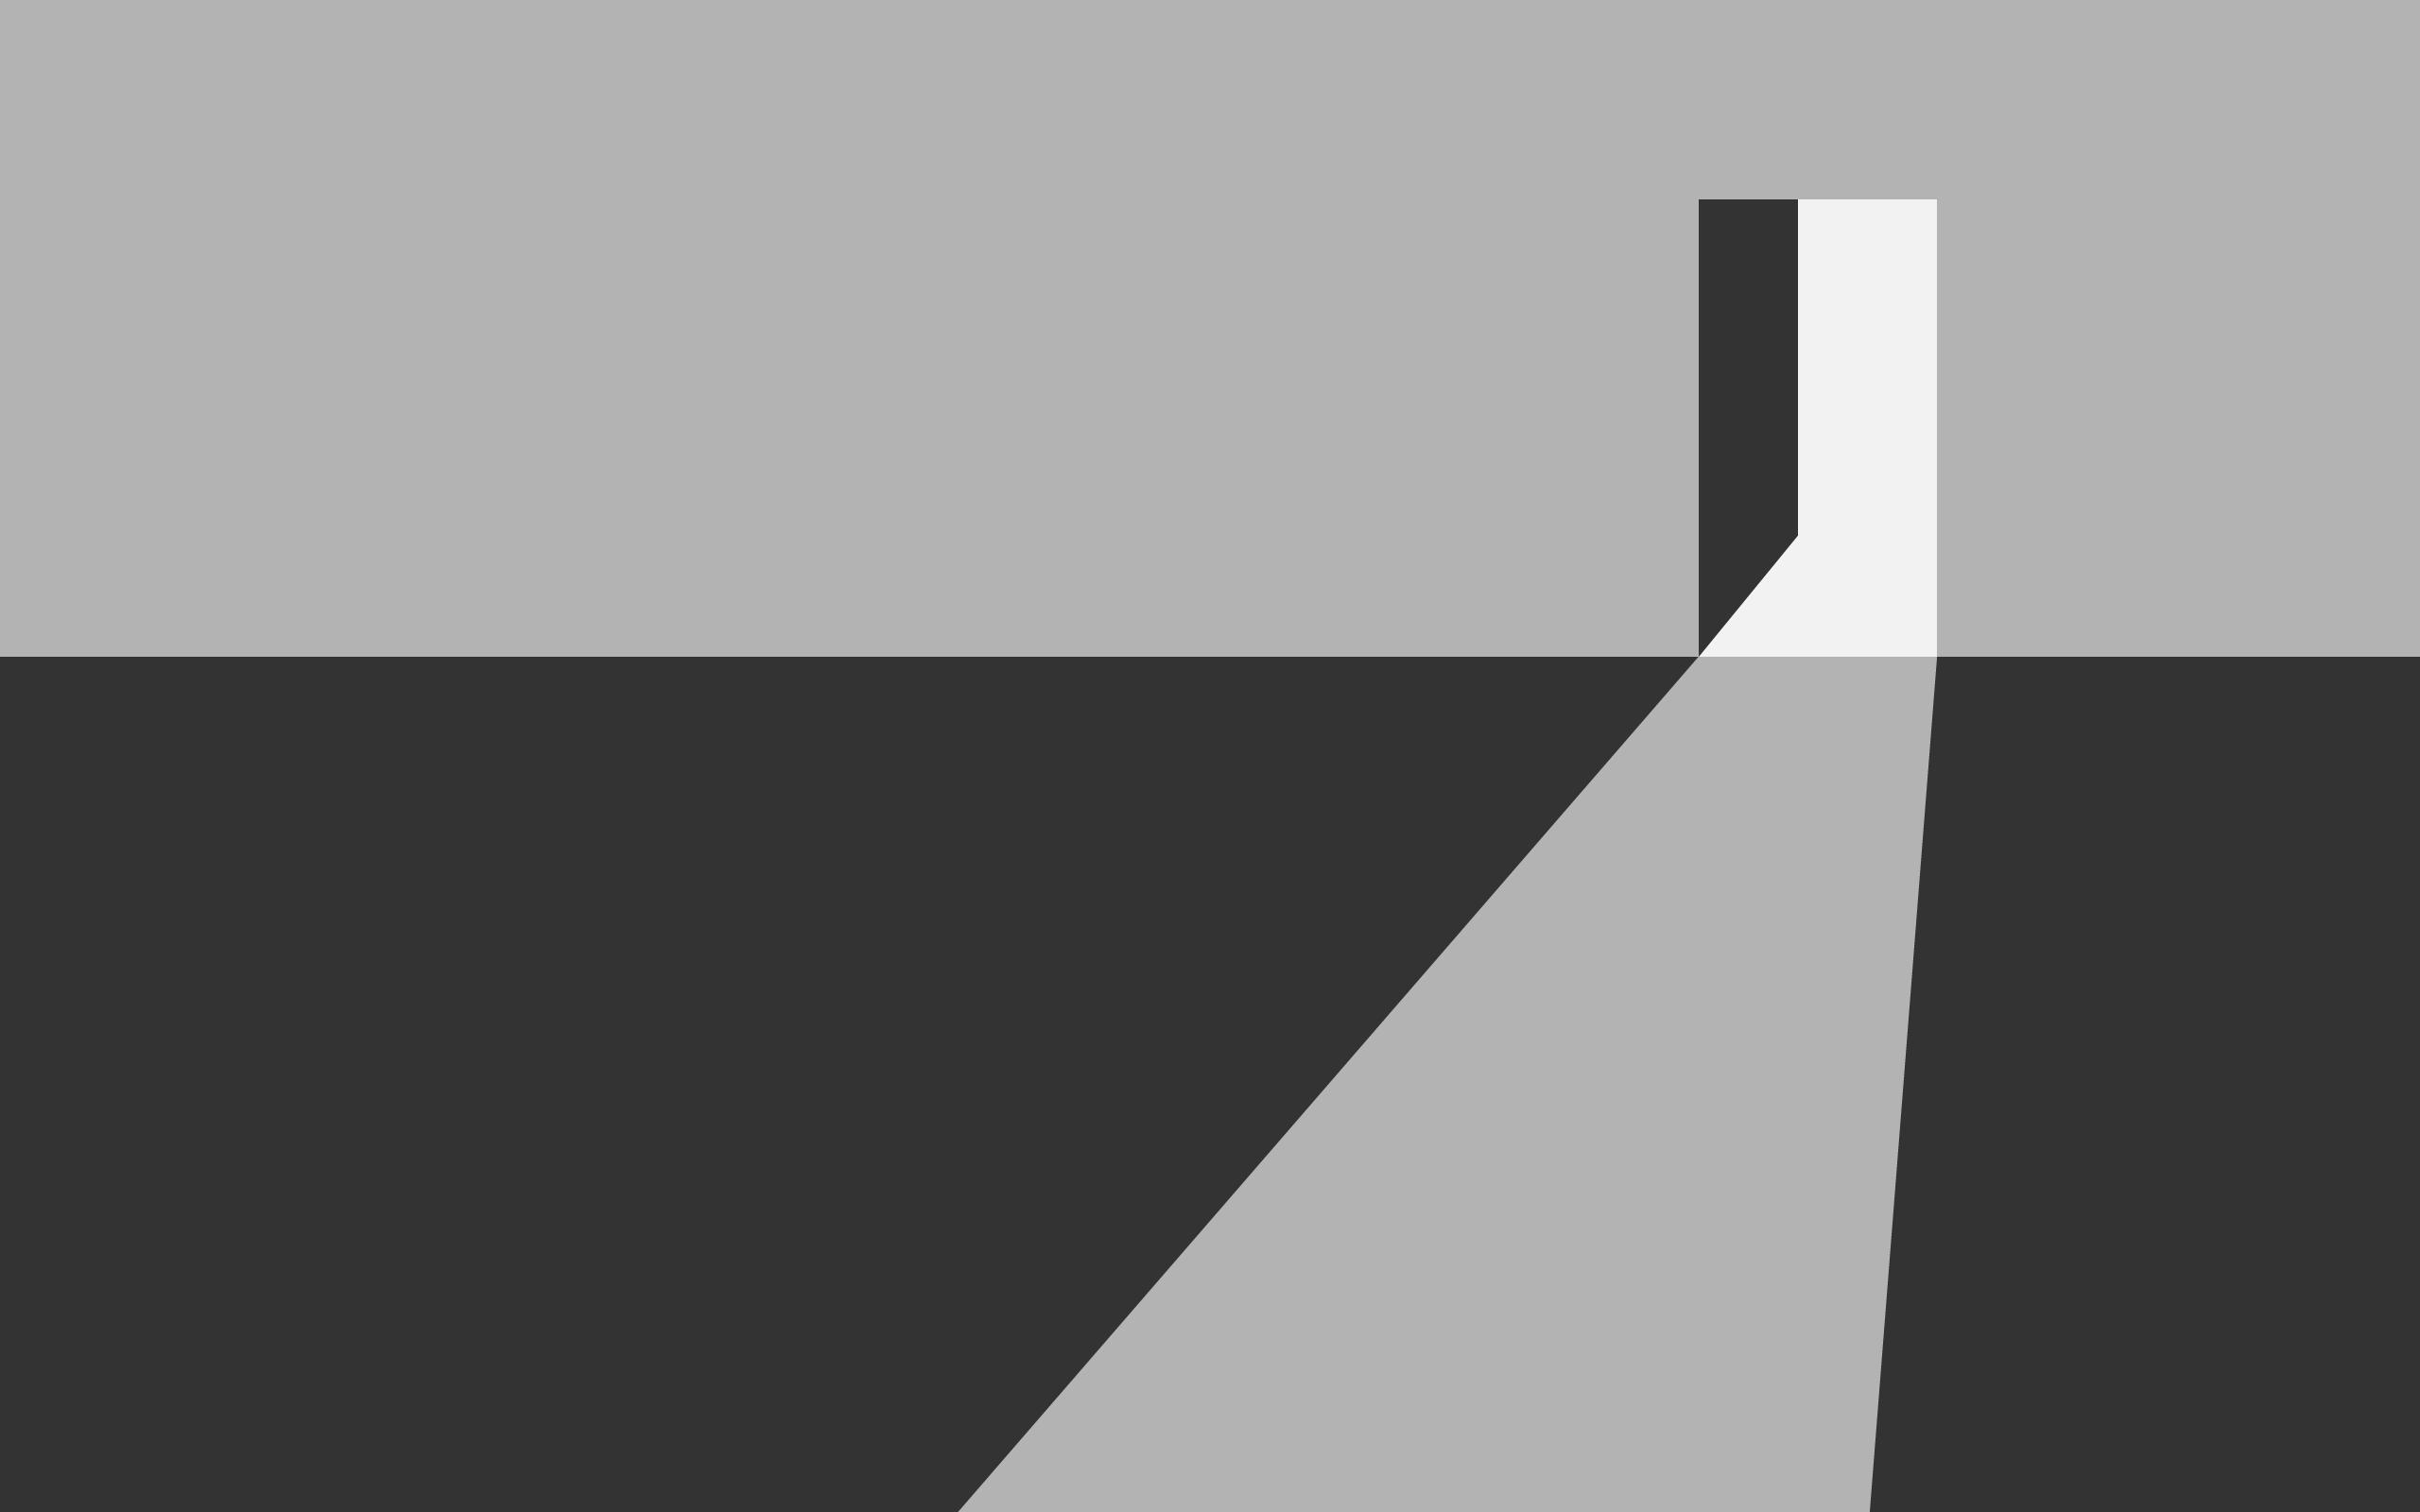 General 2560x1600 door minimalism digital art artwork simple gray geometry